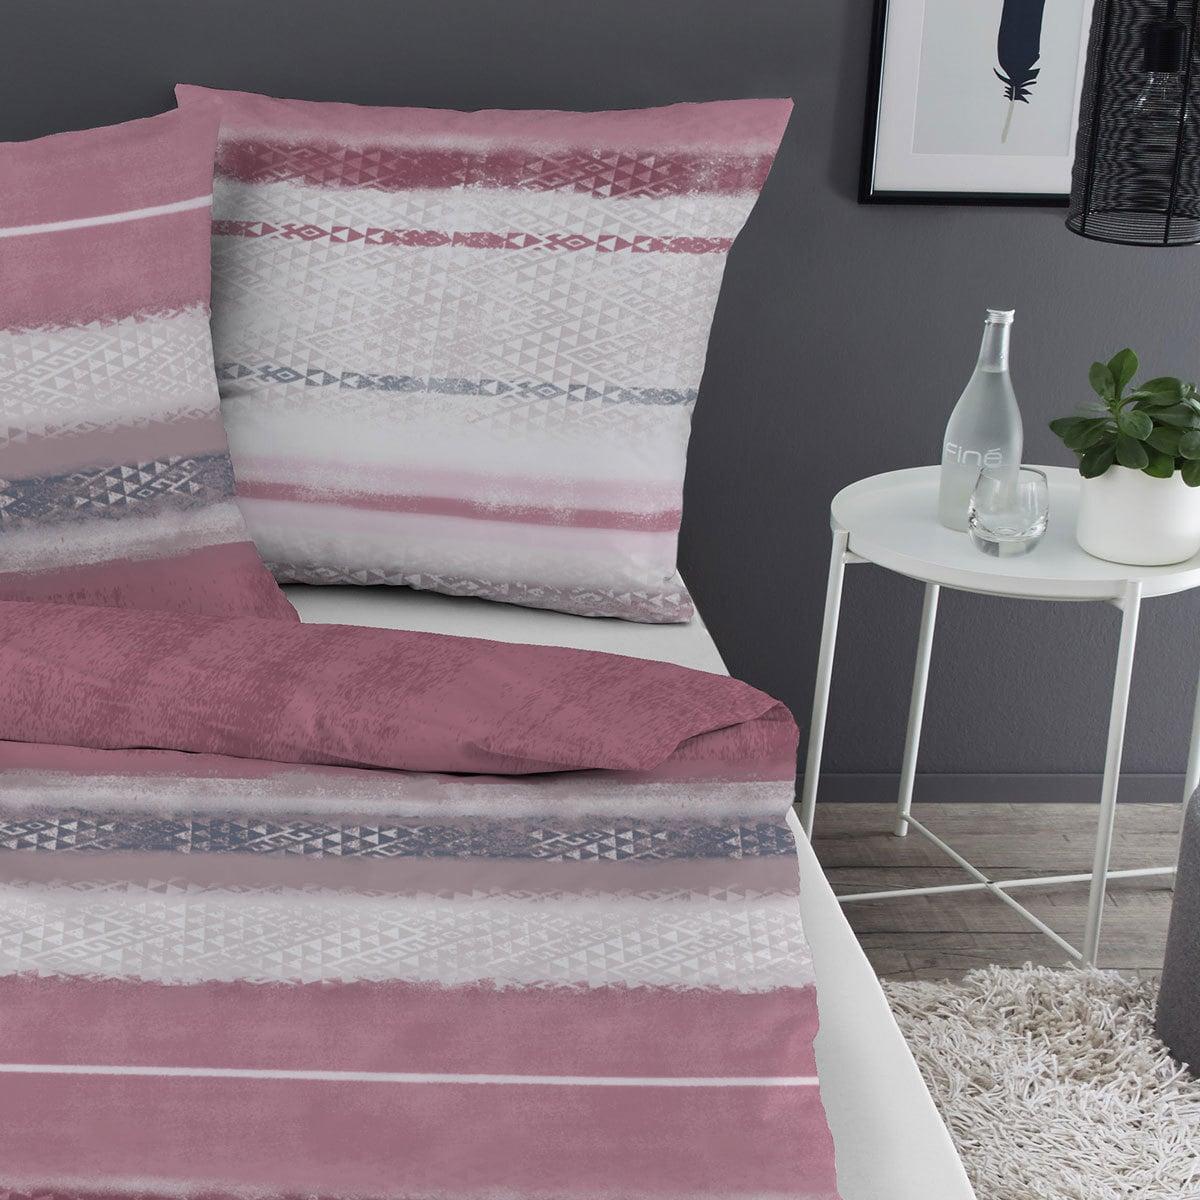 dormisette feinbiber bettw sche montreal rot grau g nstig online kaufen bei bettwaren shop. Black Bedroom Furniture Sets. Home Design Ideas